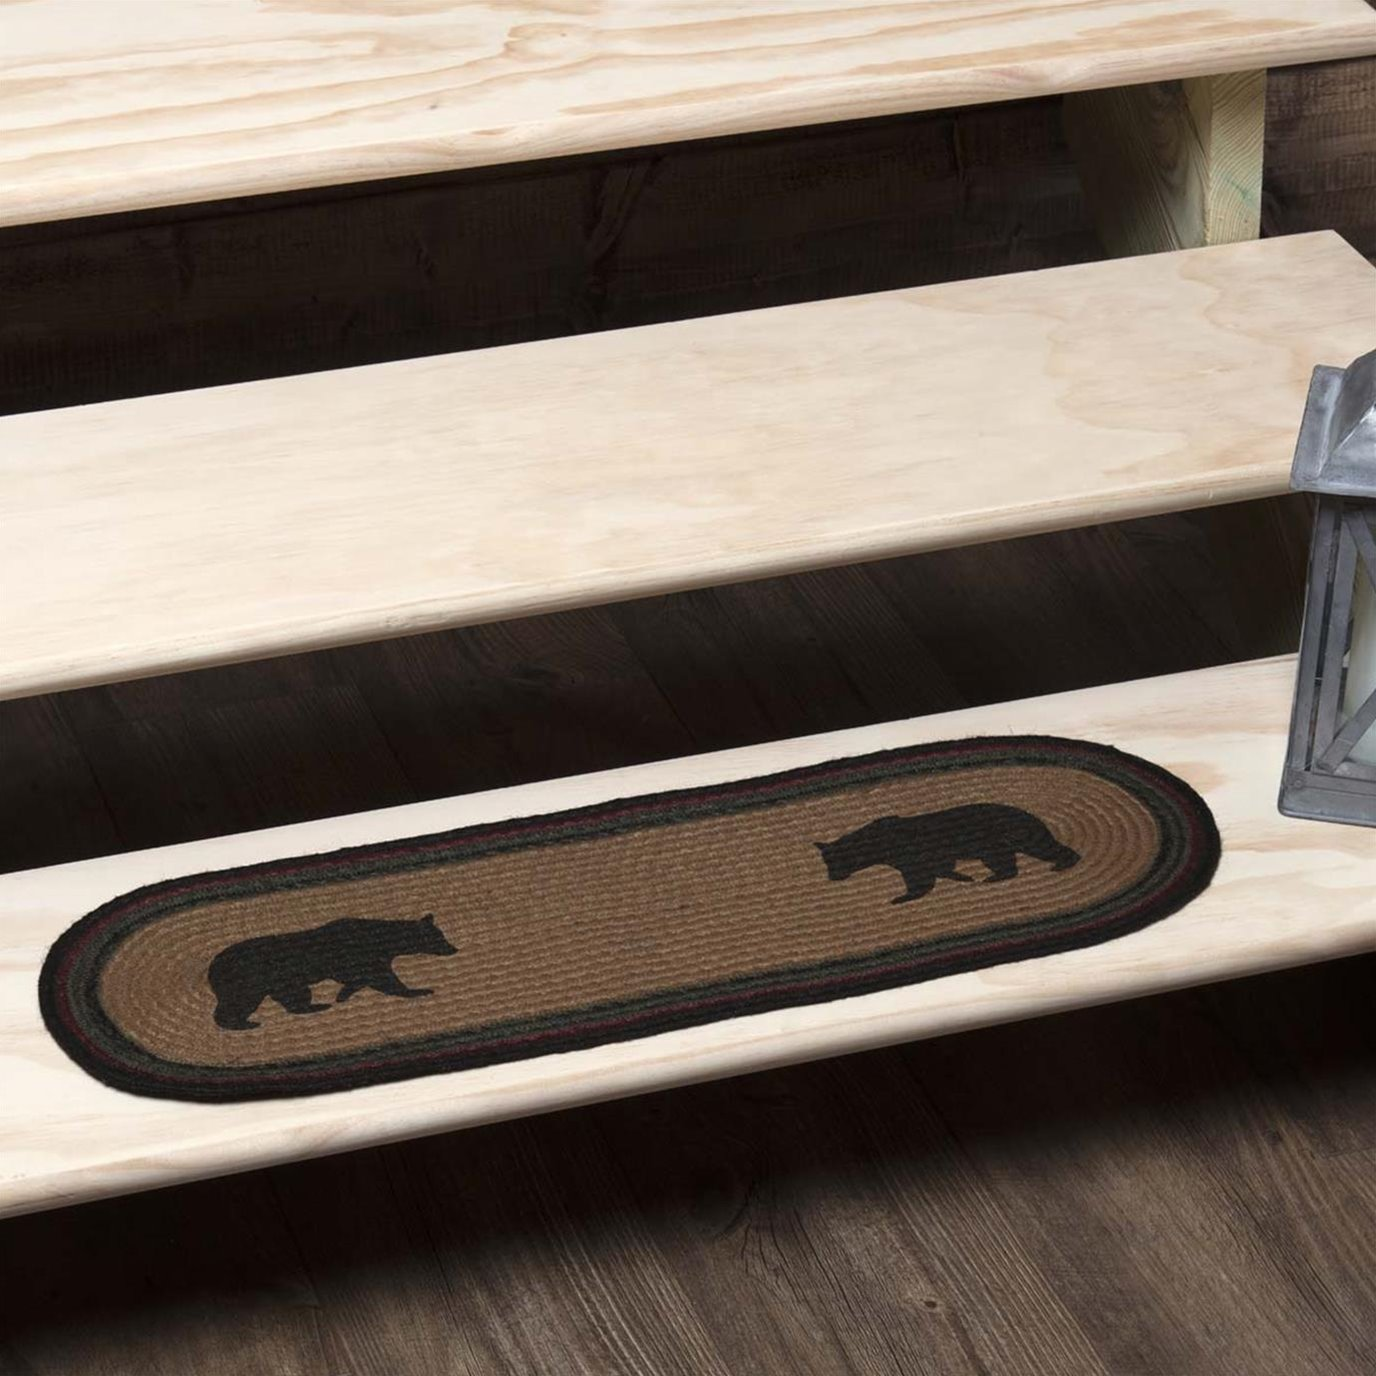 Wyatt Stenciled Bear Jute Stair Tread Oval Latex 8.5x27